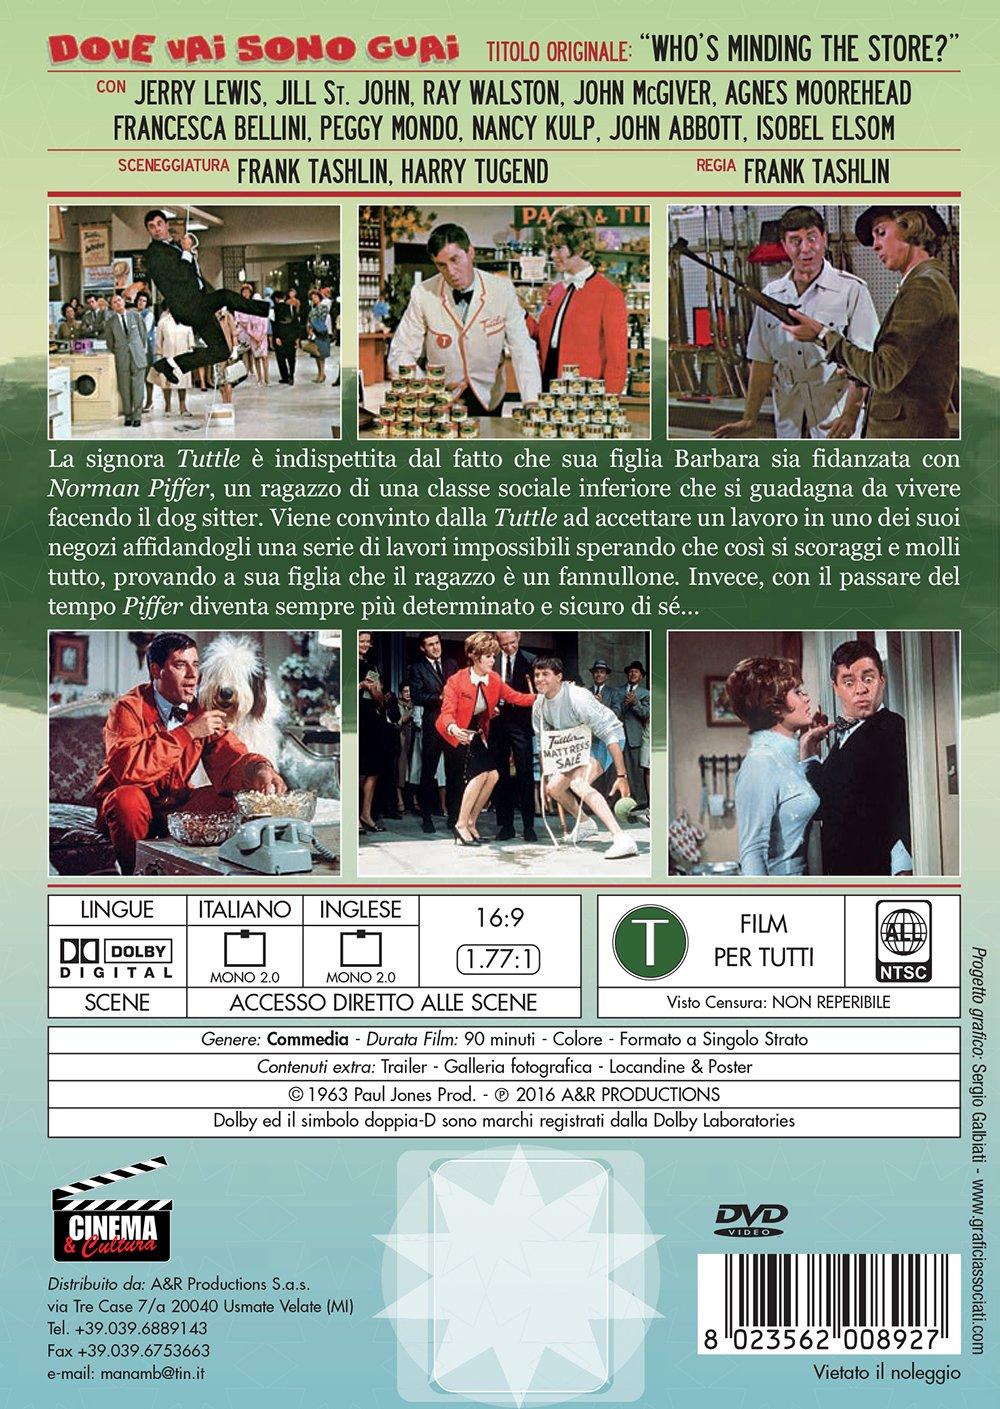 dove vai sono guai! registi frank tashlin genere commedia anno produzione 1963 Italia DVD: Amazon.es: vari: Cine y Series TV